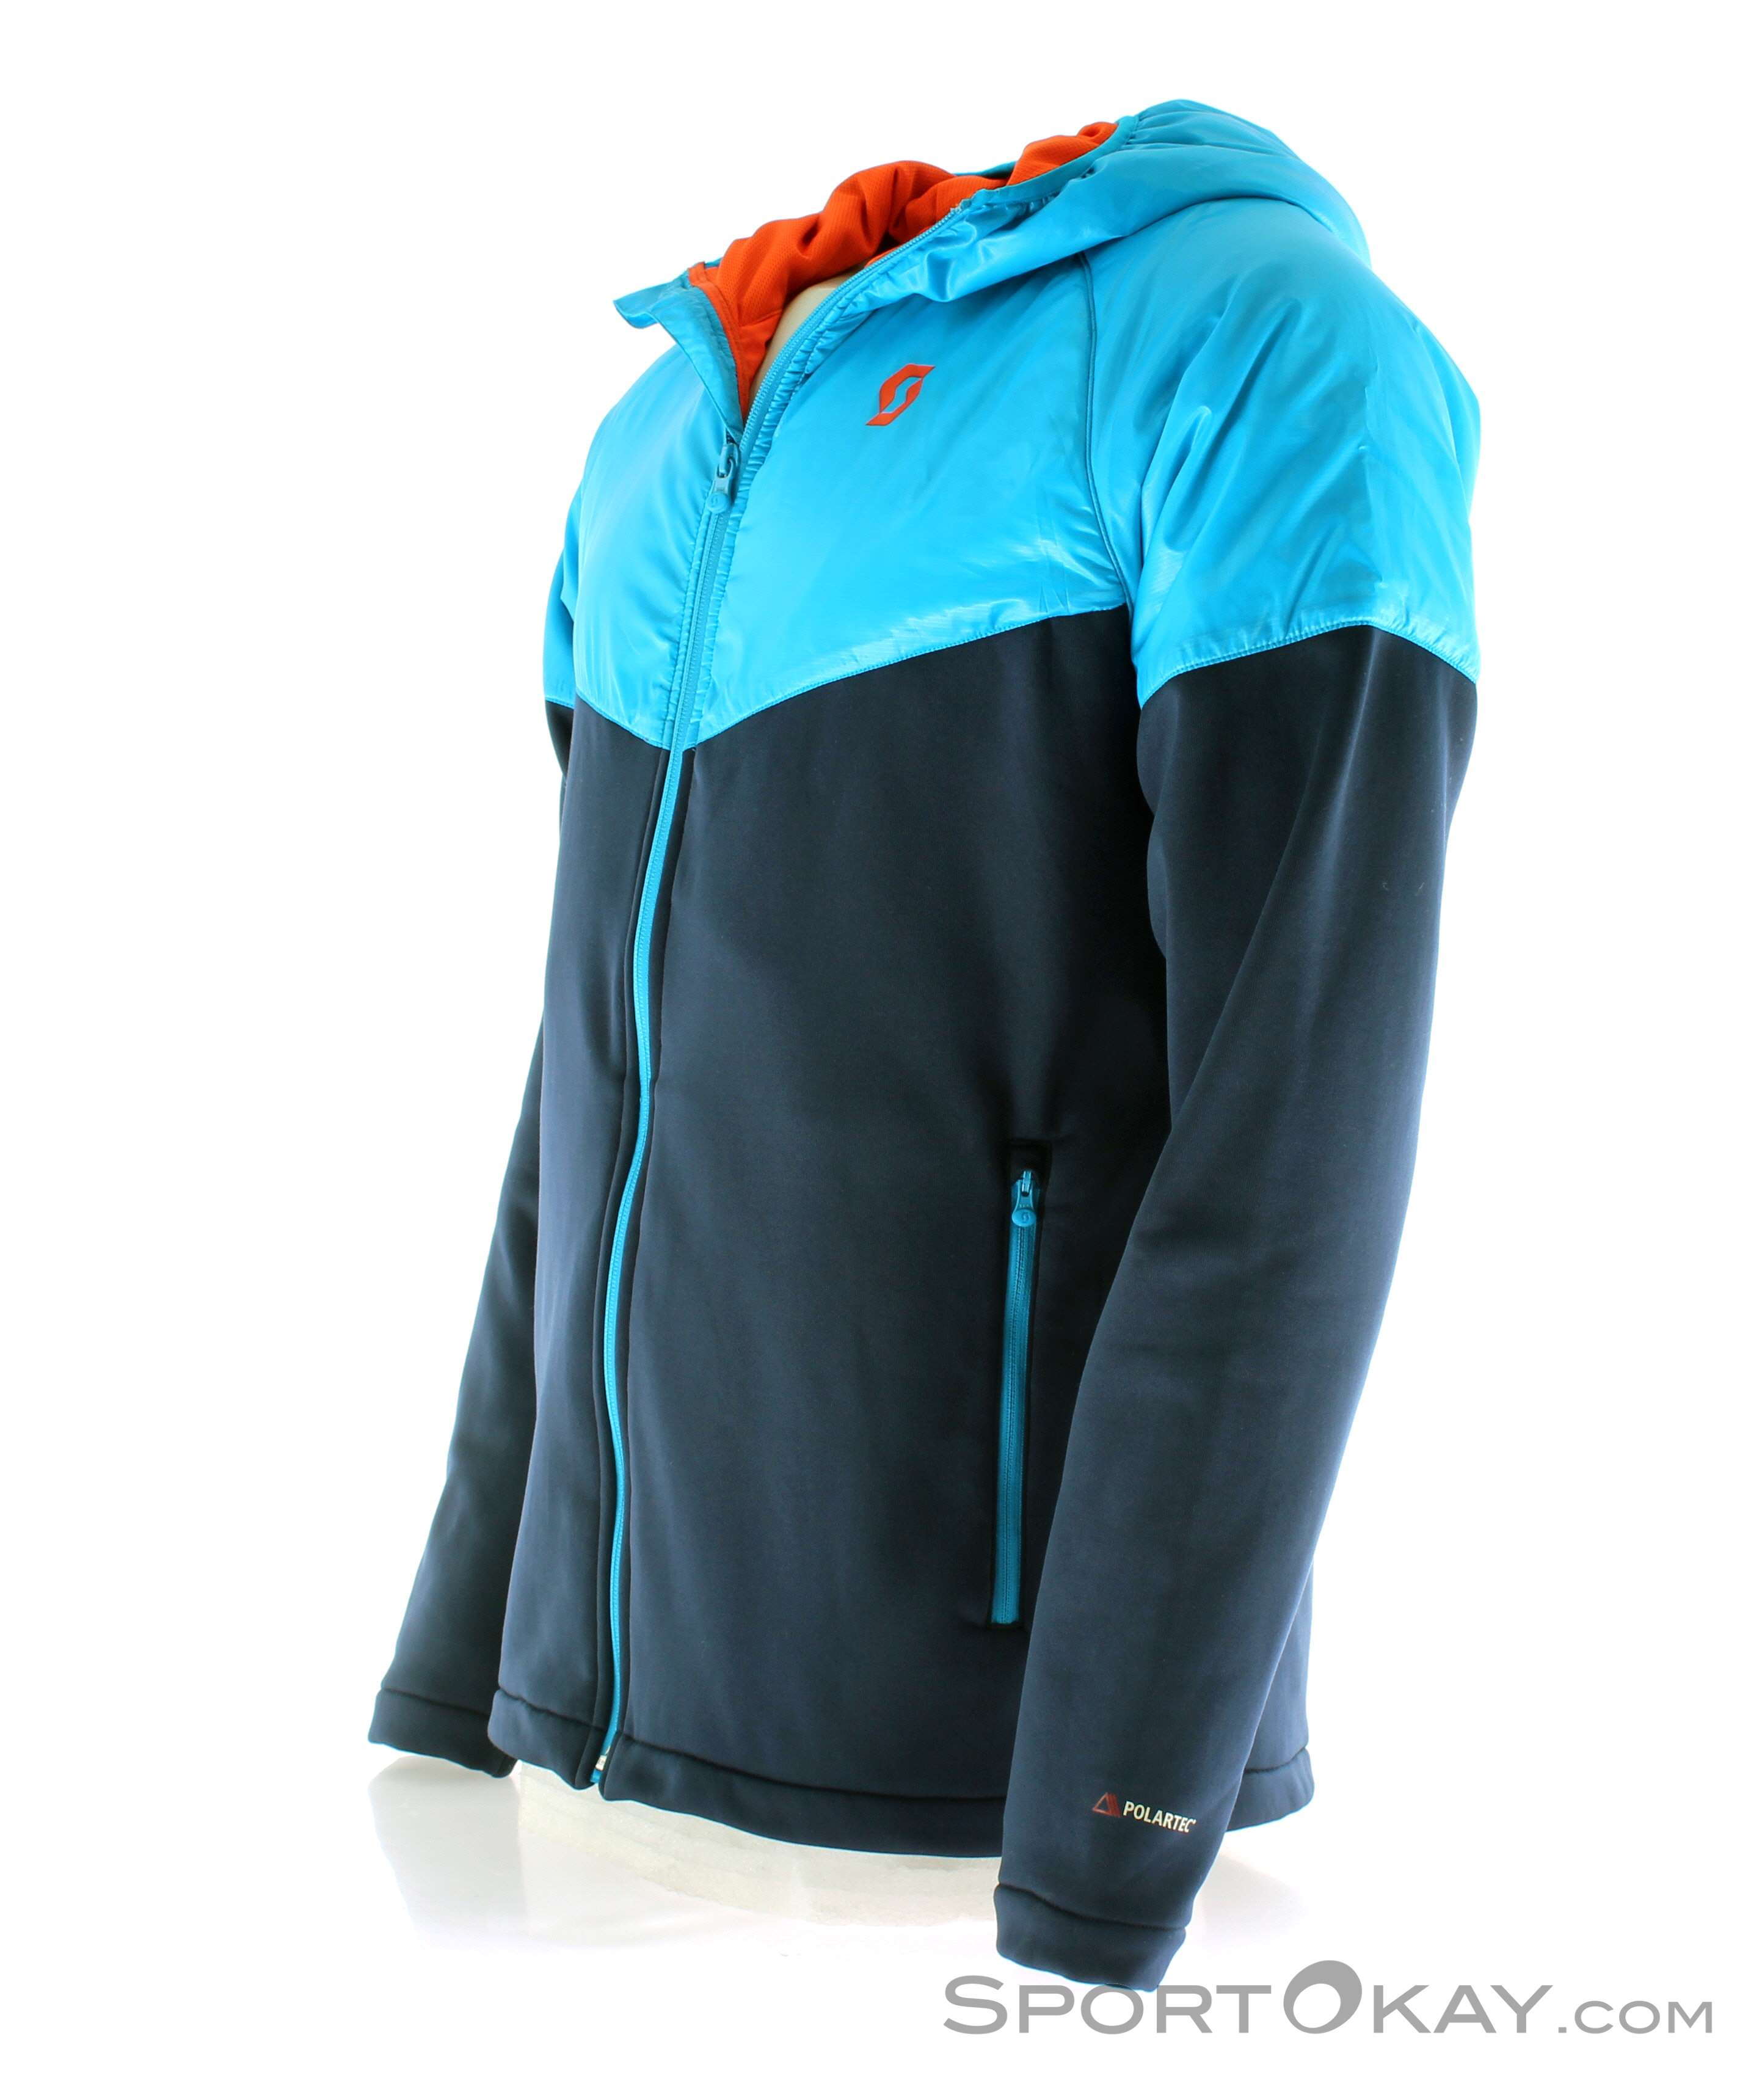 scott insuloft plus jacket herren tourensweater. Black Bedroom Furniture Sets. Home Design Ideas